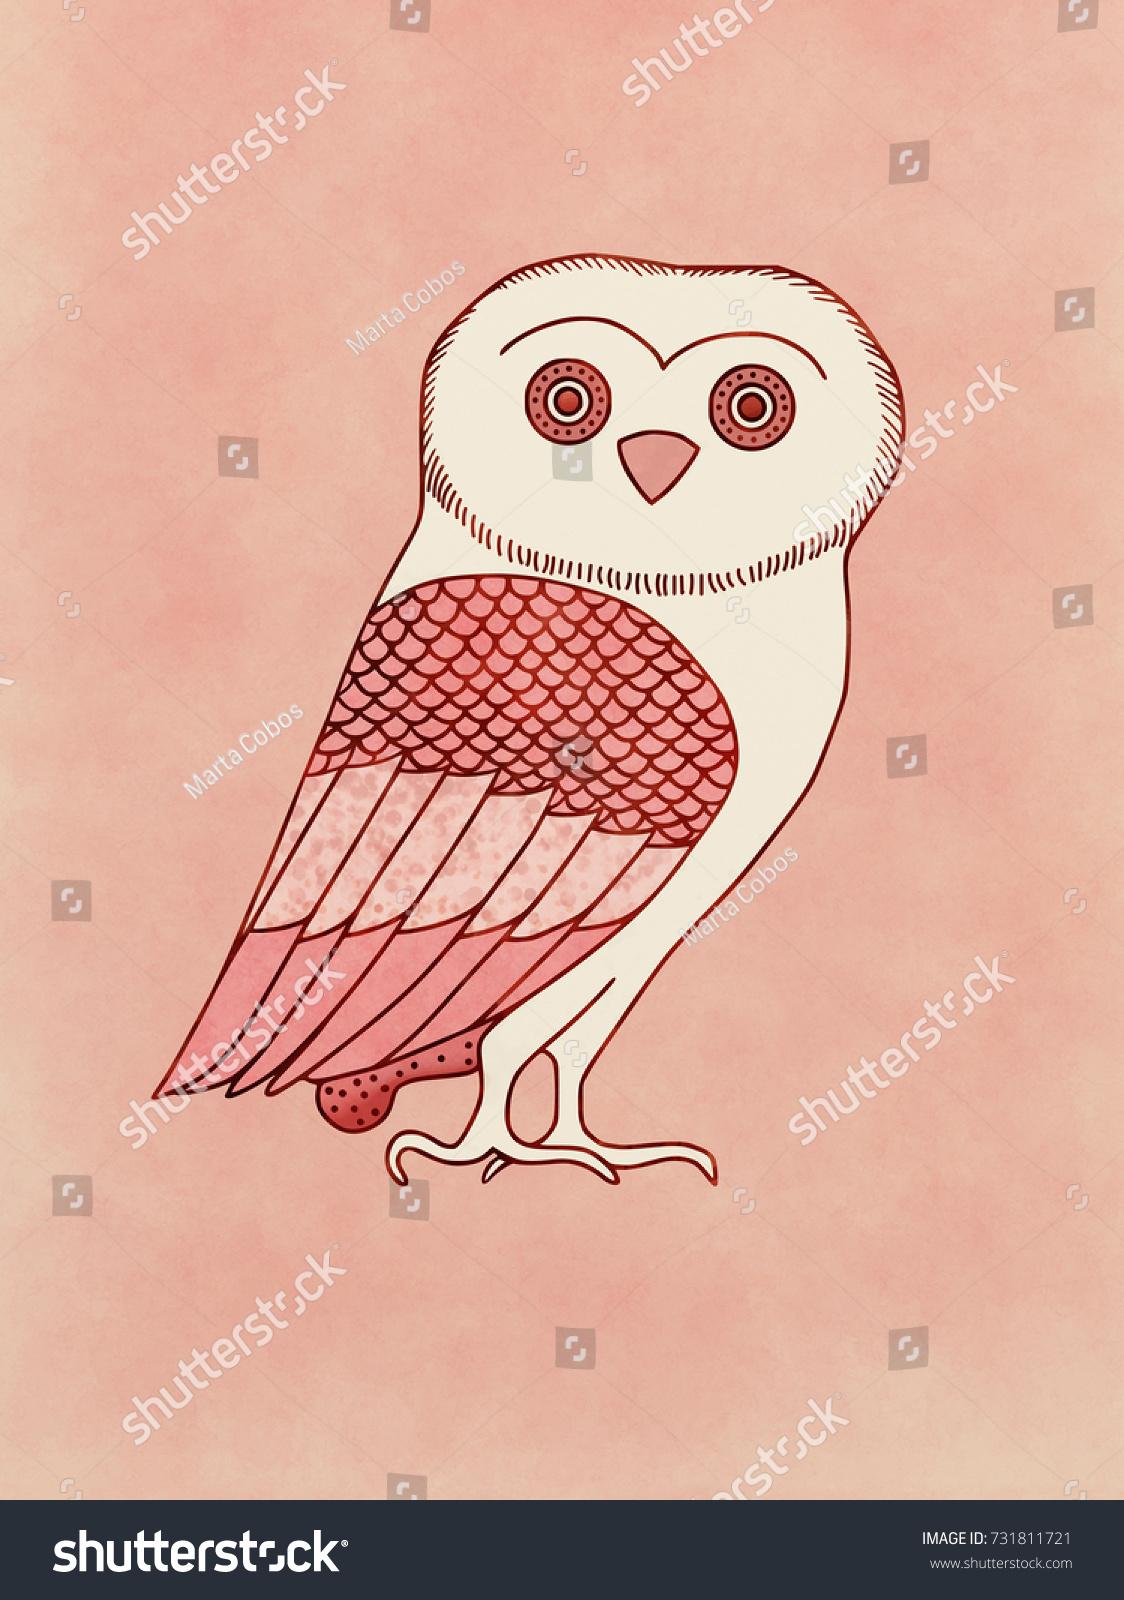 Cute Owl Symbol Athena Goddess Athens Stock Illustration 731811721